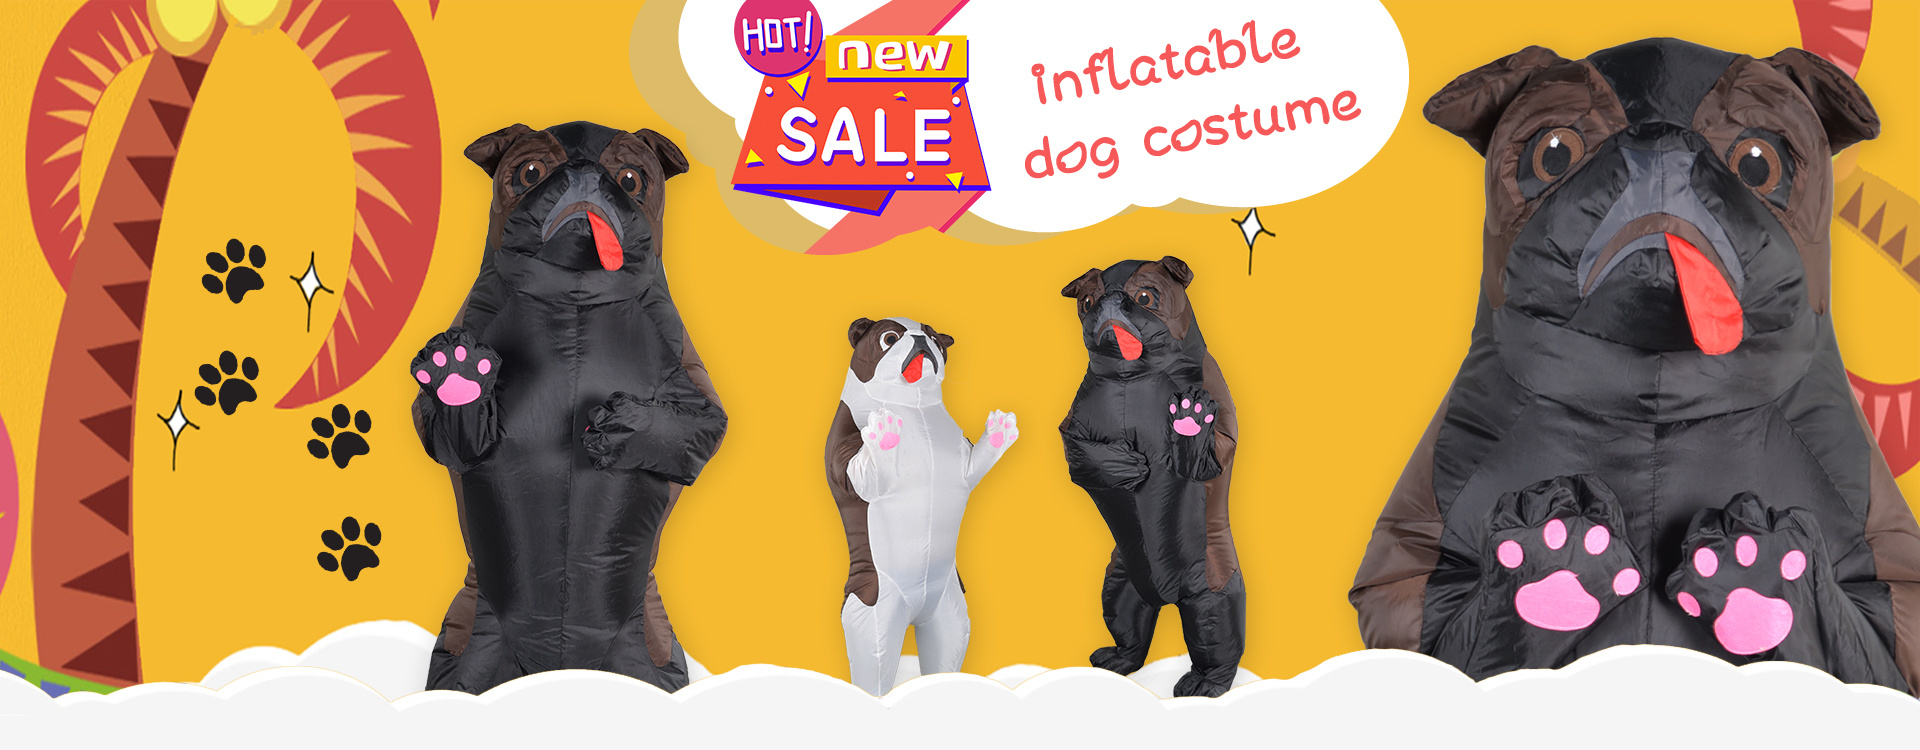 Cachorro quente traje inflável festa cosplay trajes